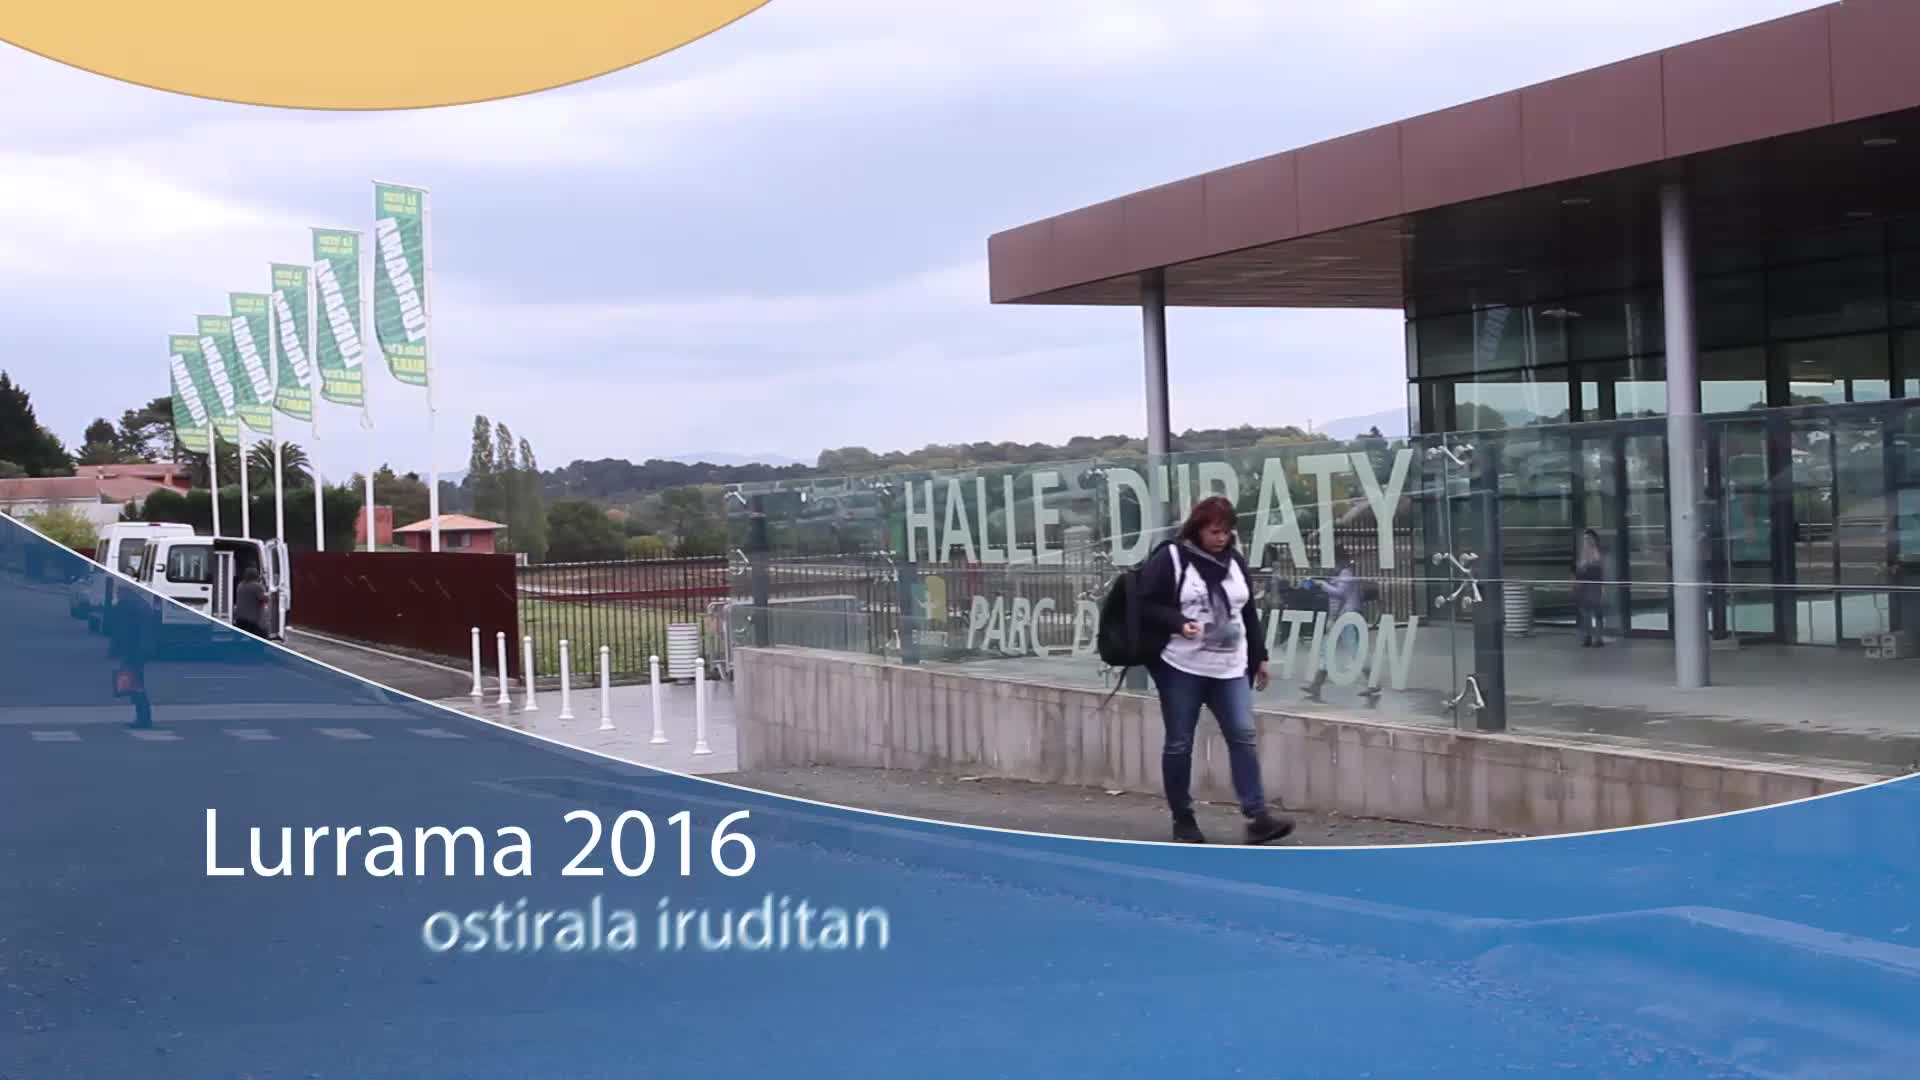 LURRAMA 2016: ostirala iruditan